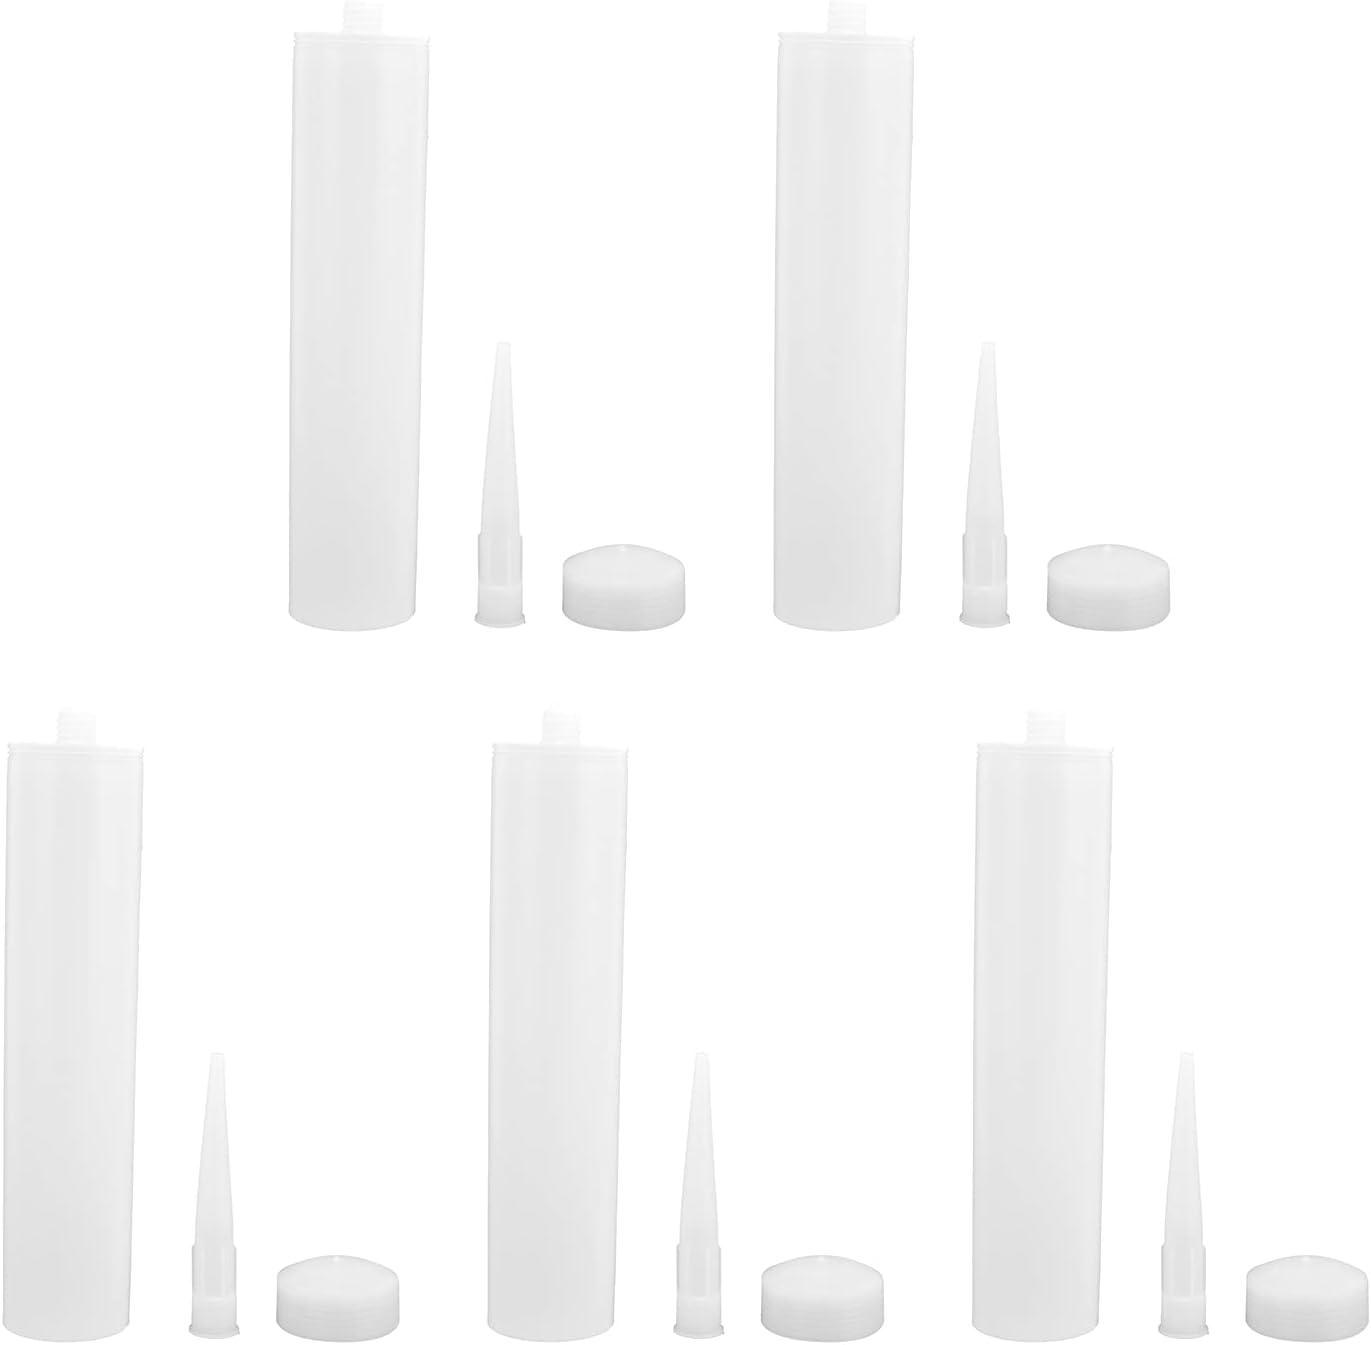 5 sets Caulk Max 49% OFF Tube 300ml White Las Vegas Mall and Caulking PC Squee Sealant